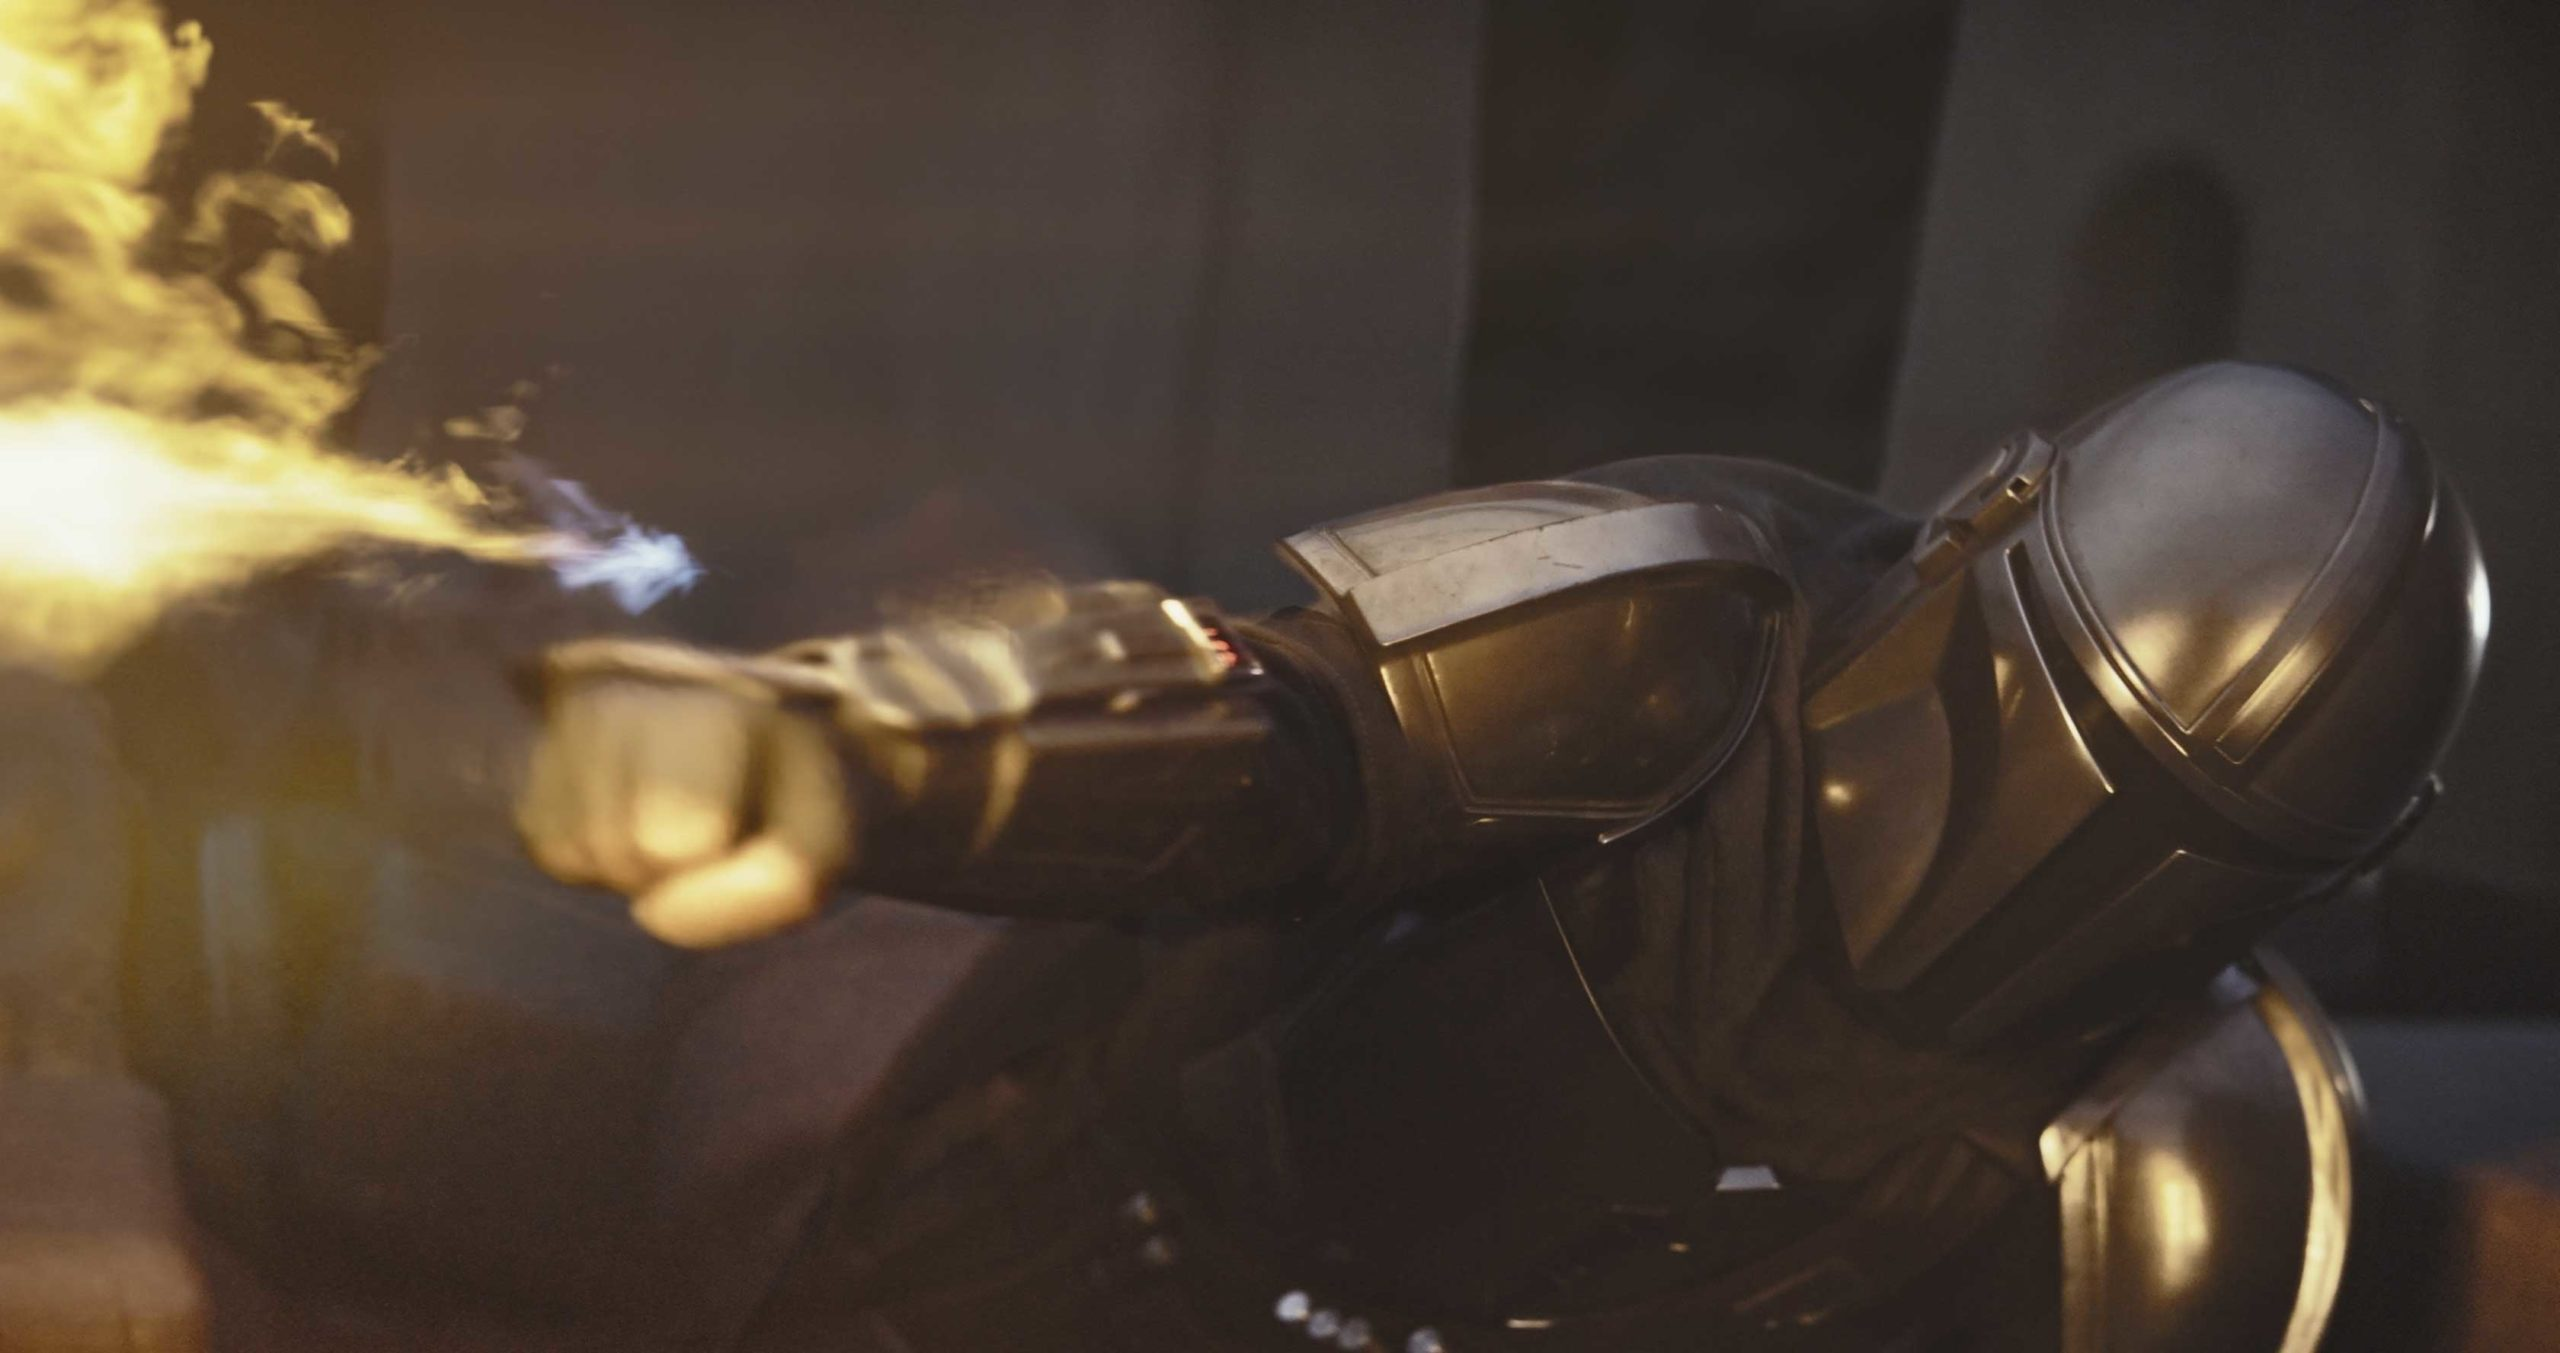 The Mandalorian flamethrower